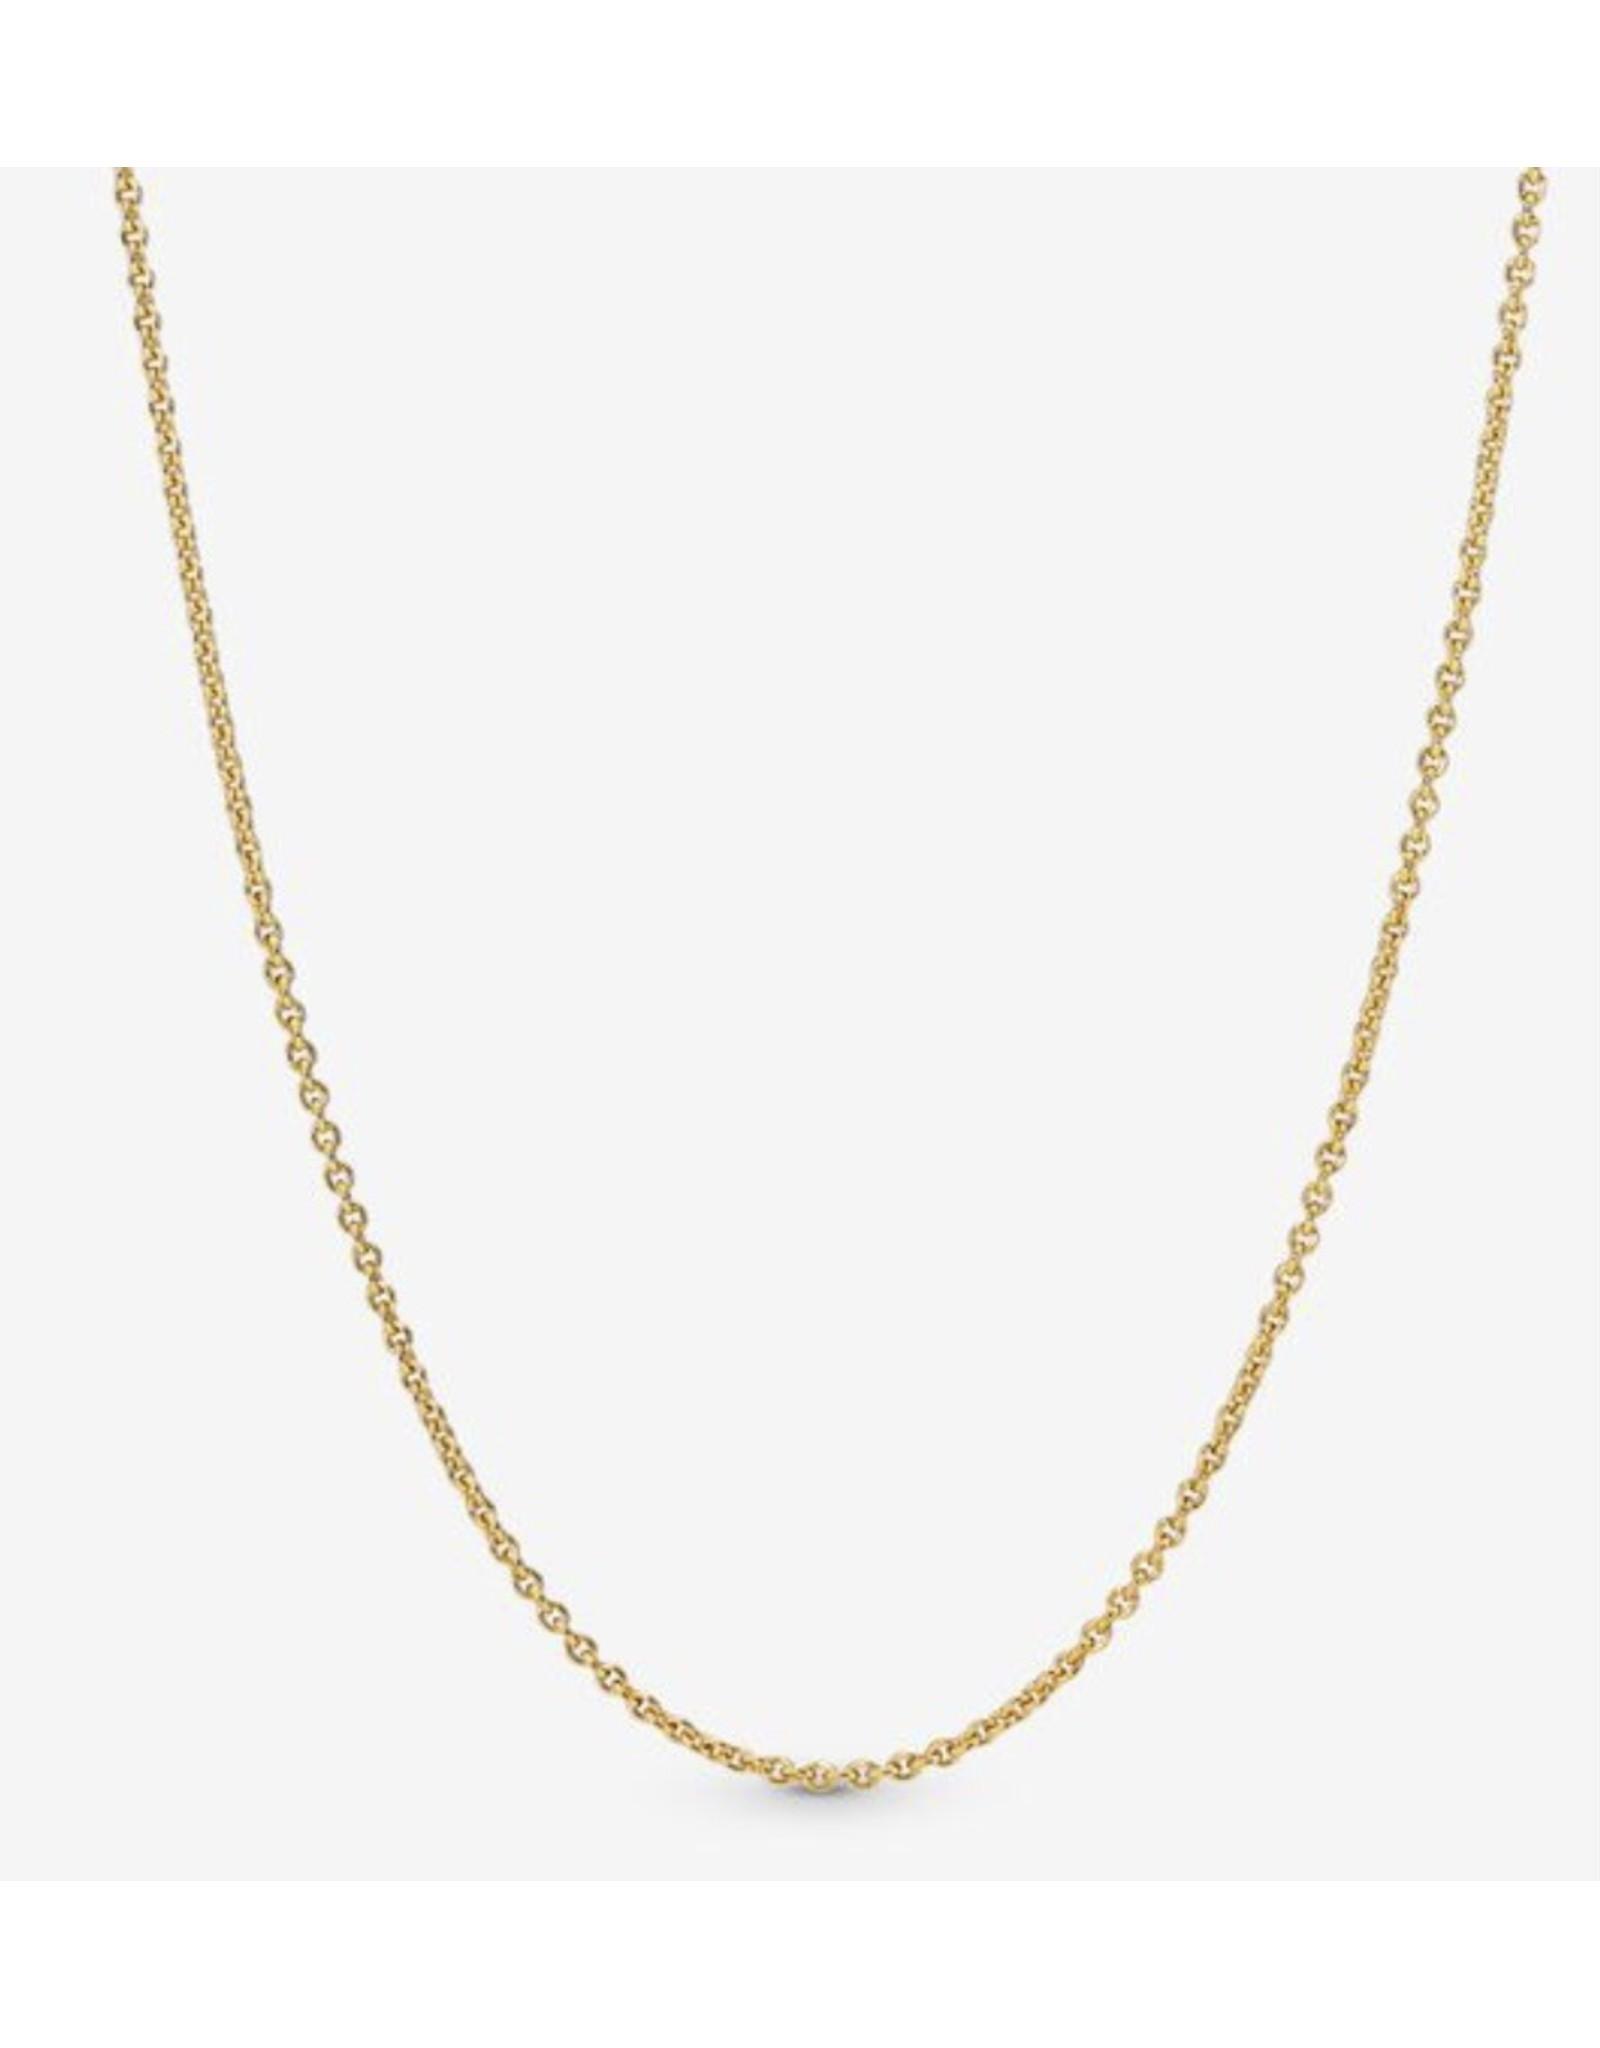 Pandora Pandora Necklace,368727C00-45, Shine, Adjustable